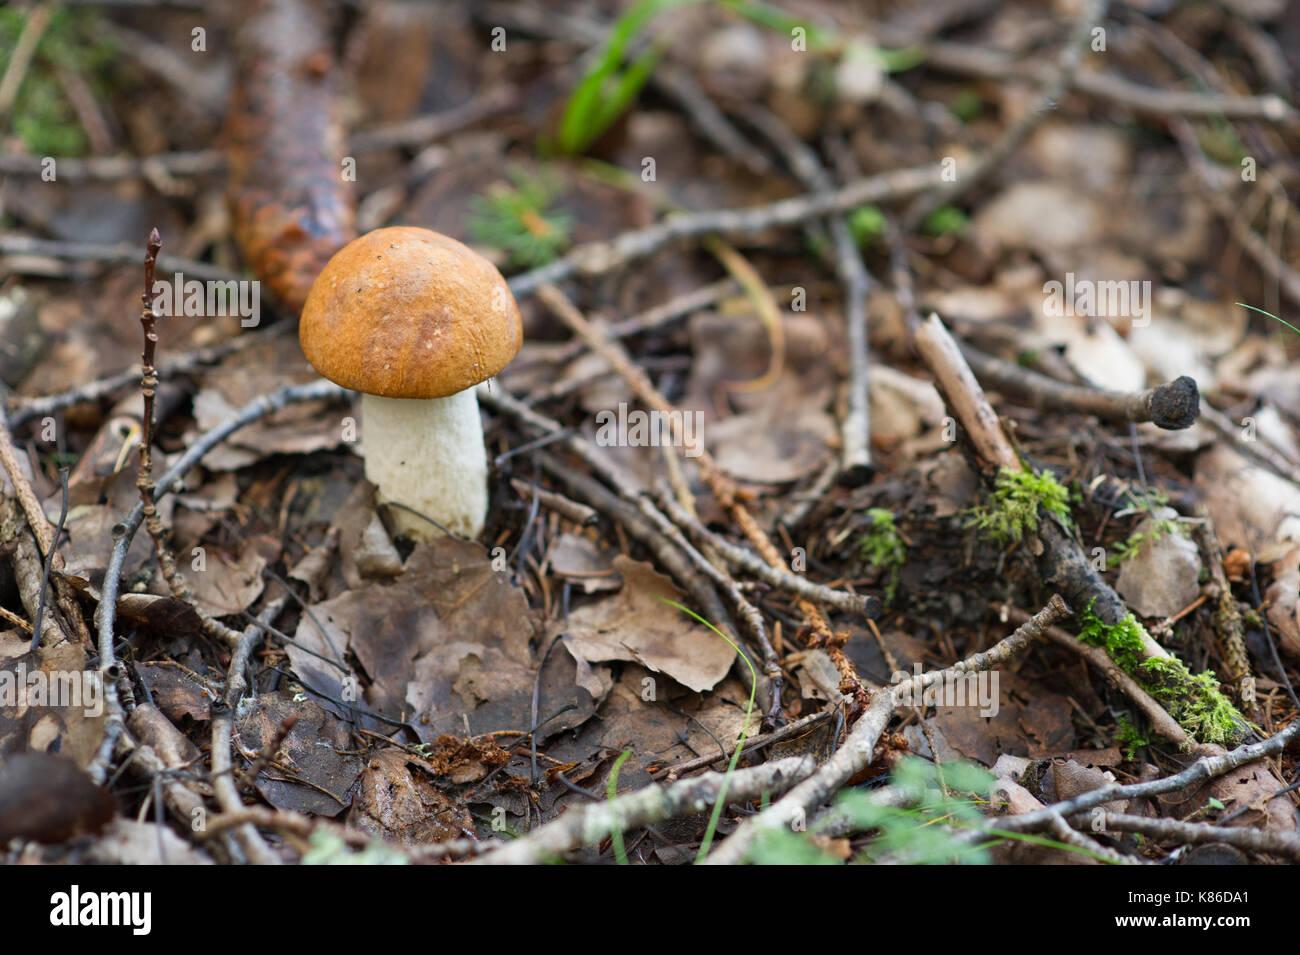 Mushroom in Swedish forest. - Stock Image